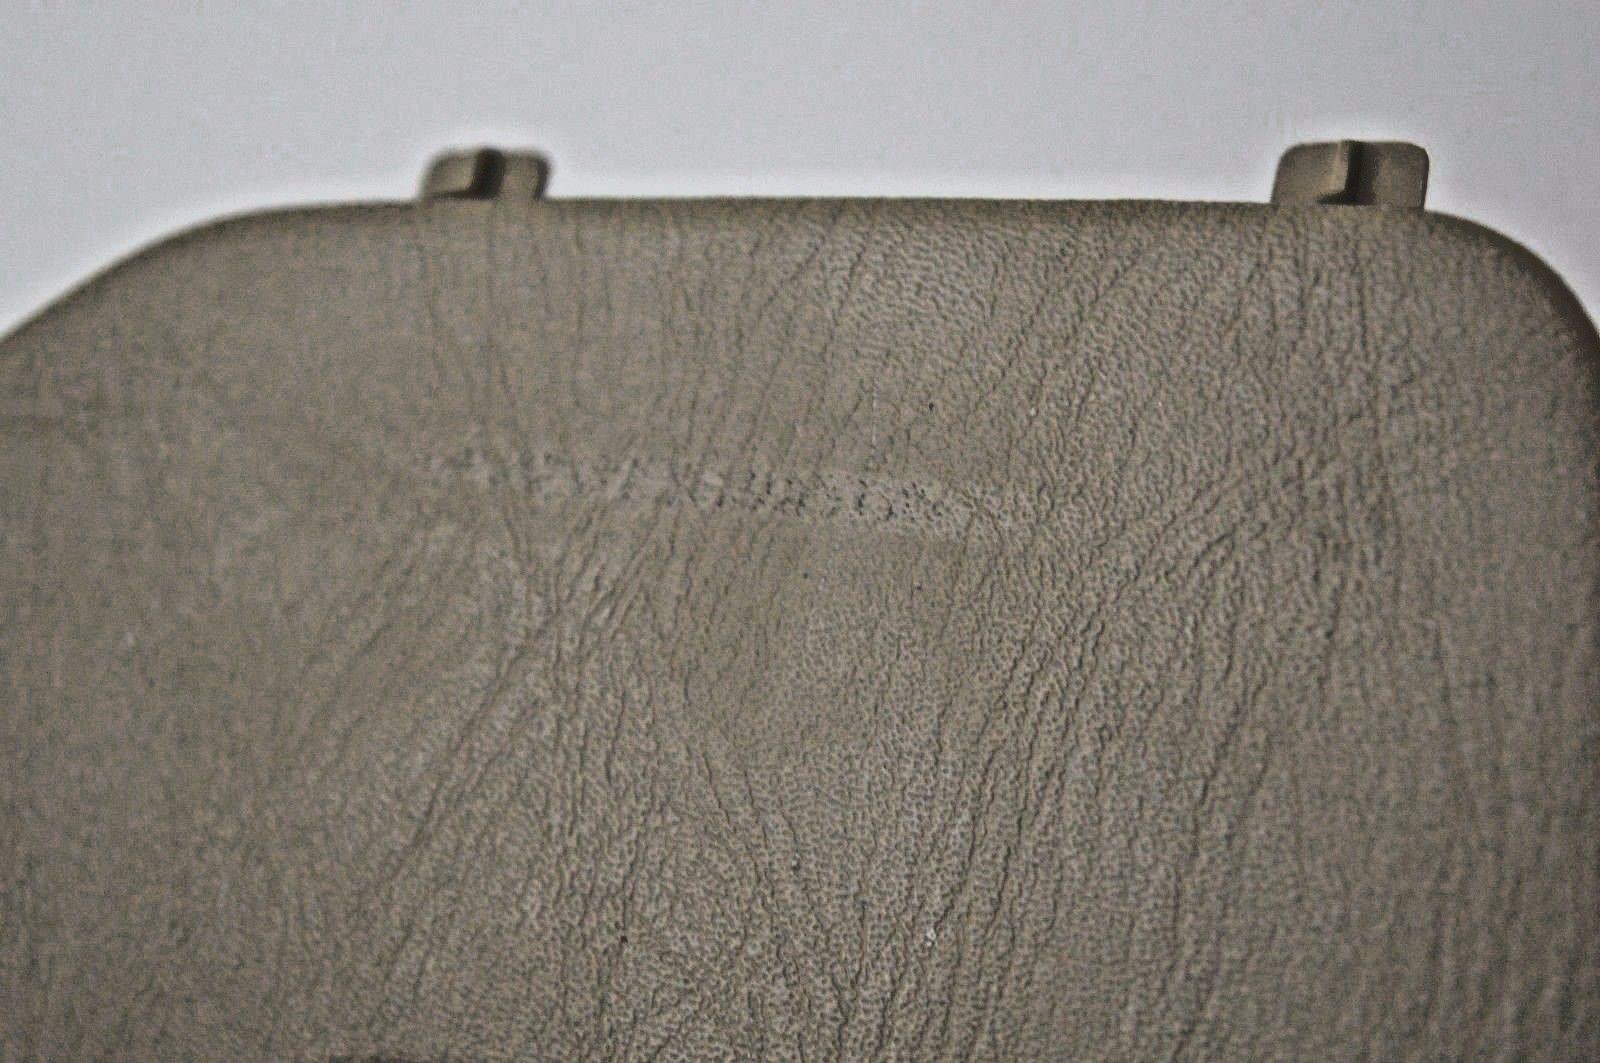 00 01 02 03 Nissan Maxima Tan Fuse Block And 50 Similar Items 2002 Box Cover Lid Door Panel Oem 2000